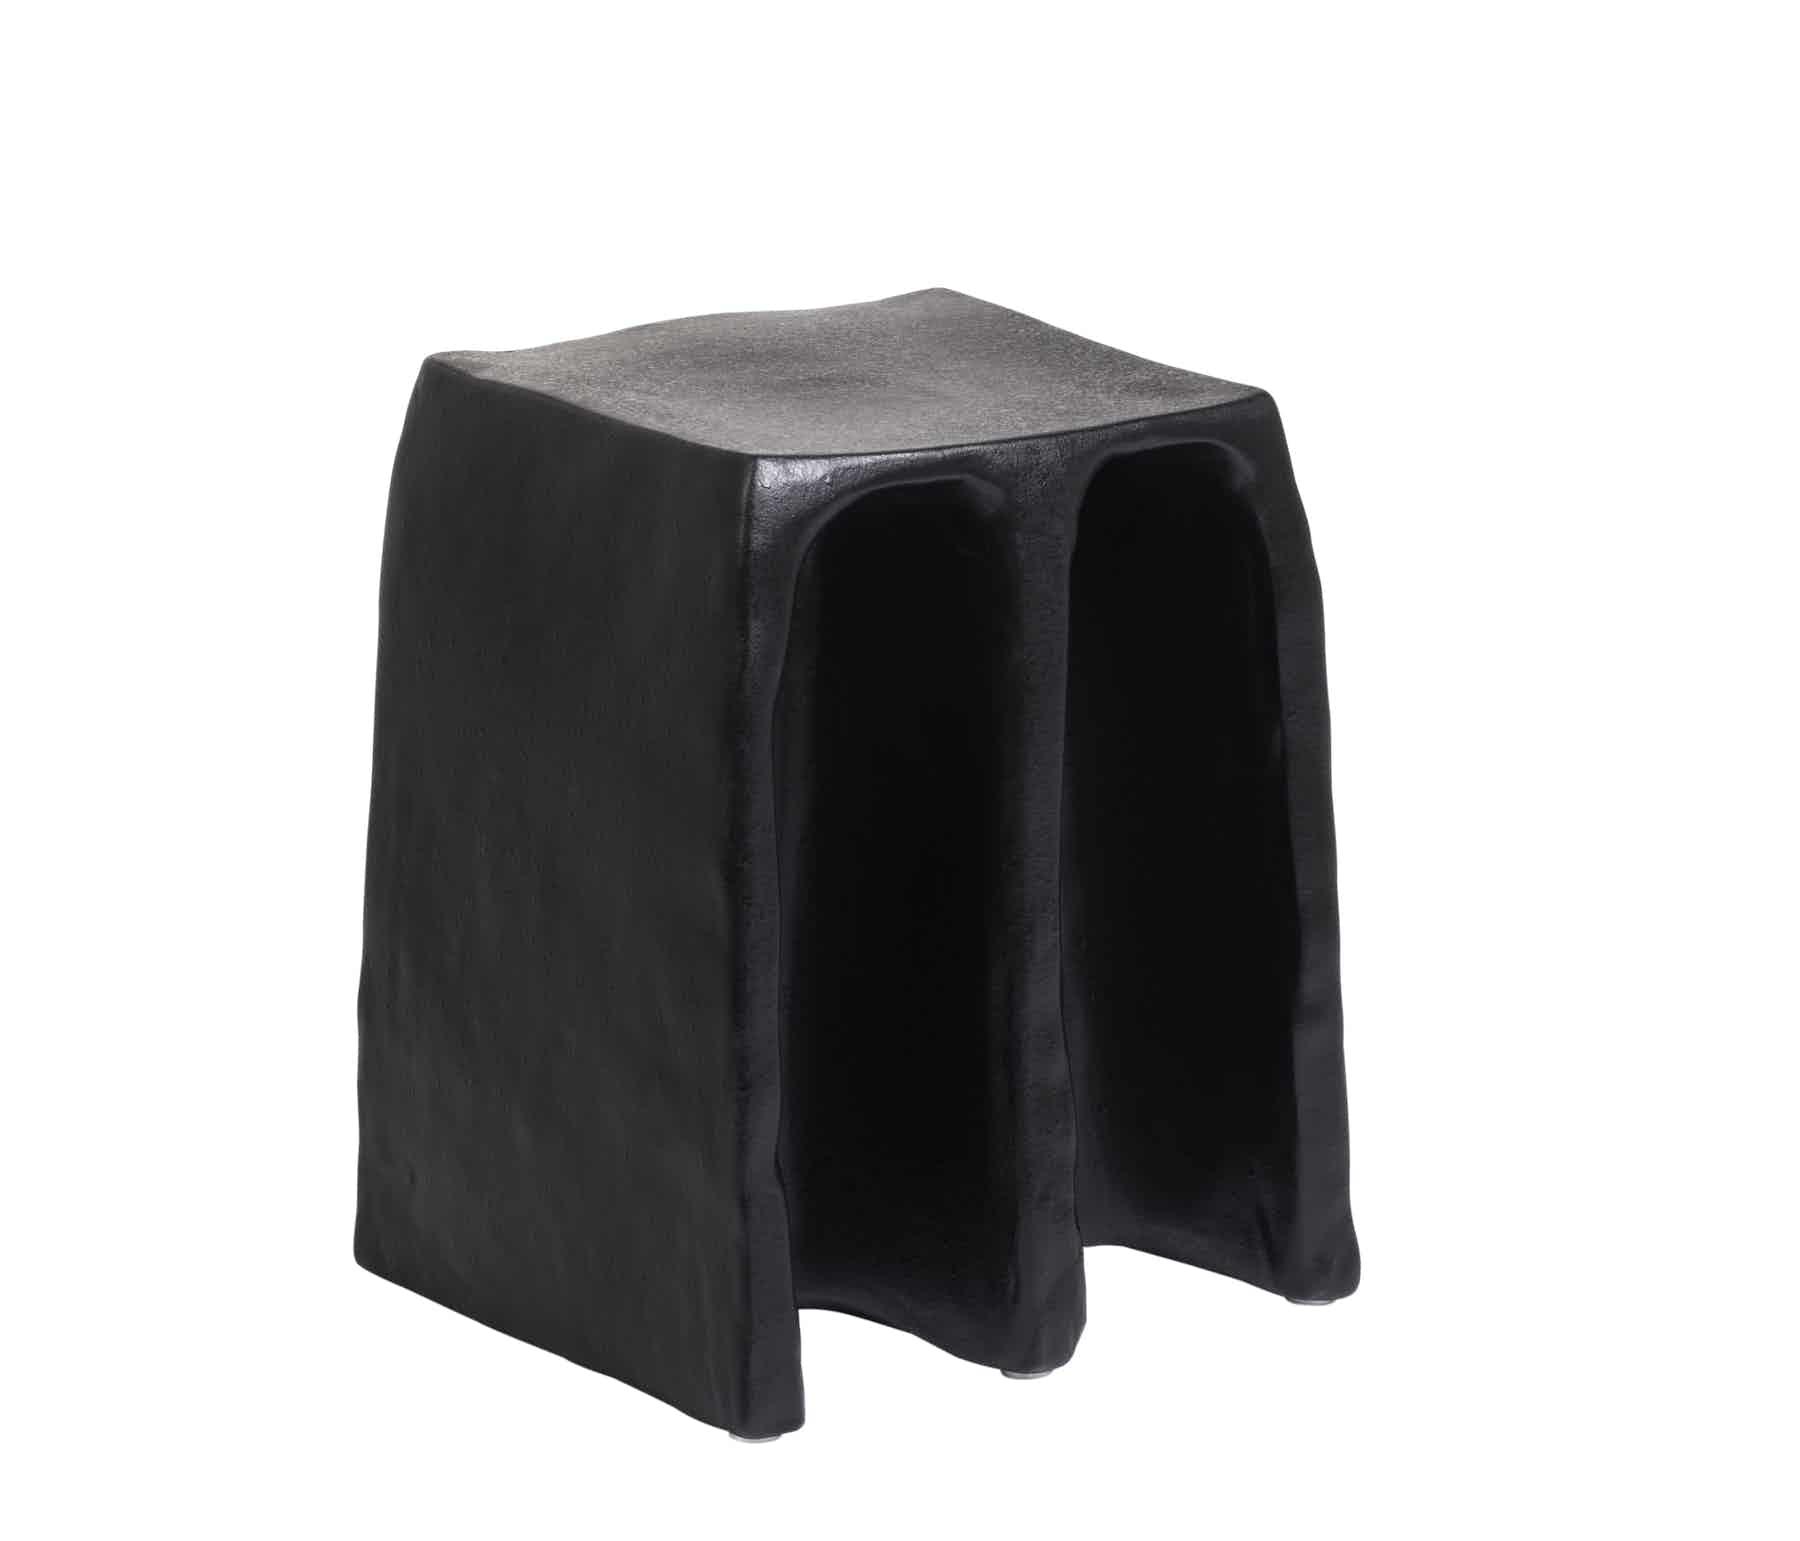 Pulpo-chouchou-stool-black-haute-living